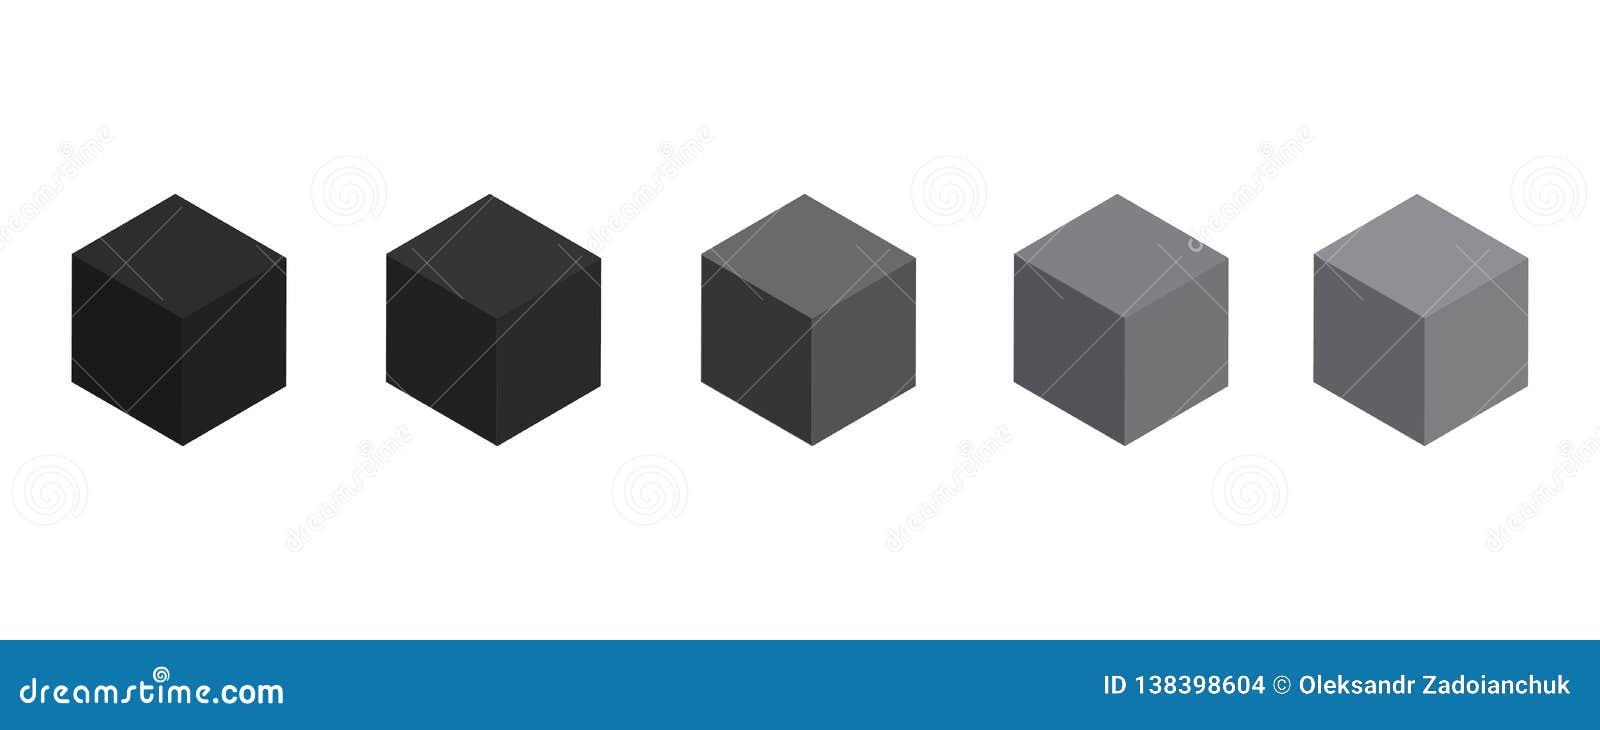 3d黑色立方体 黑匣子 您的图形设计的传染媒介